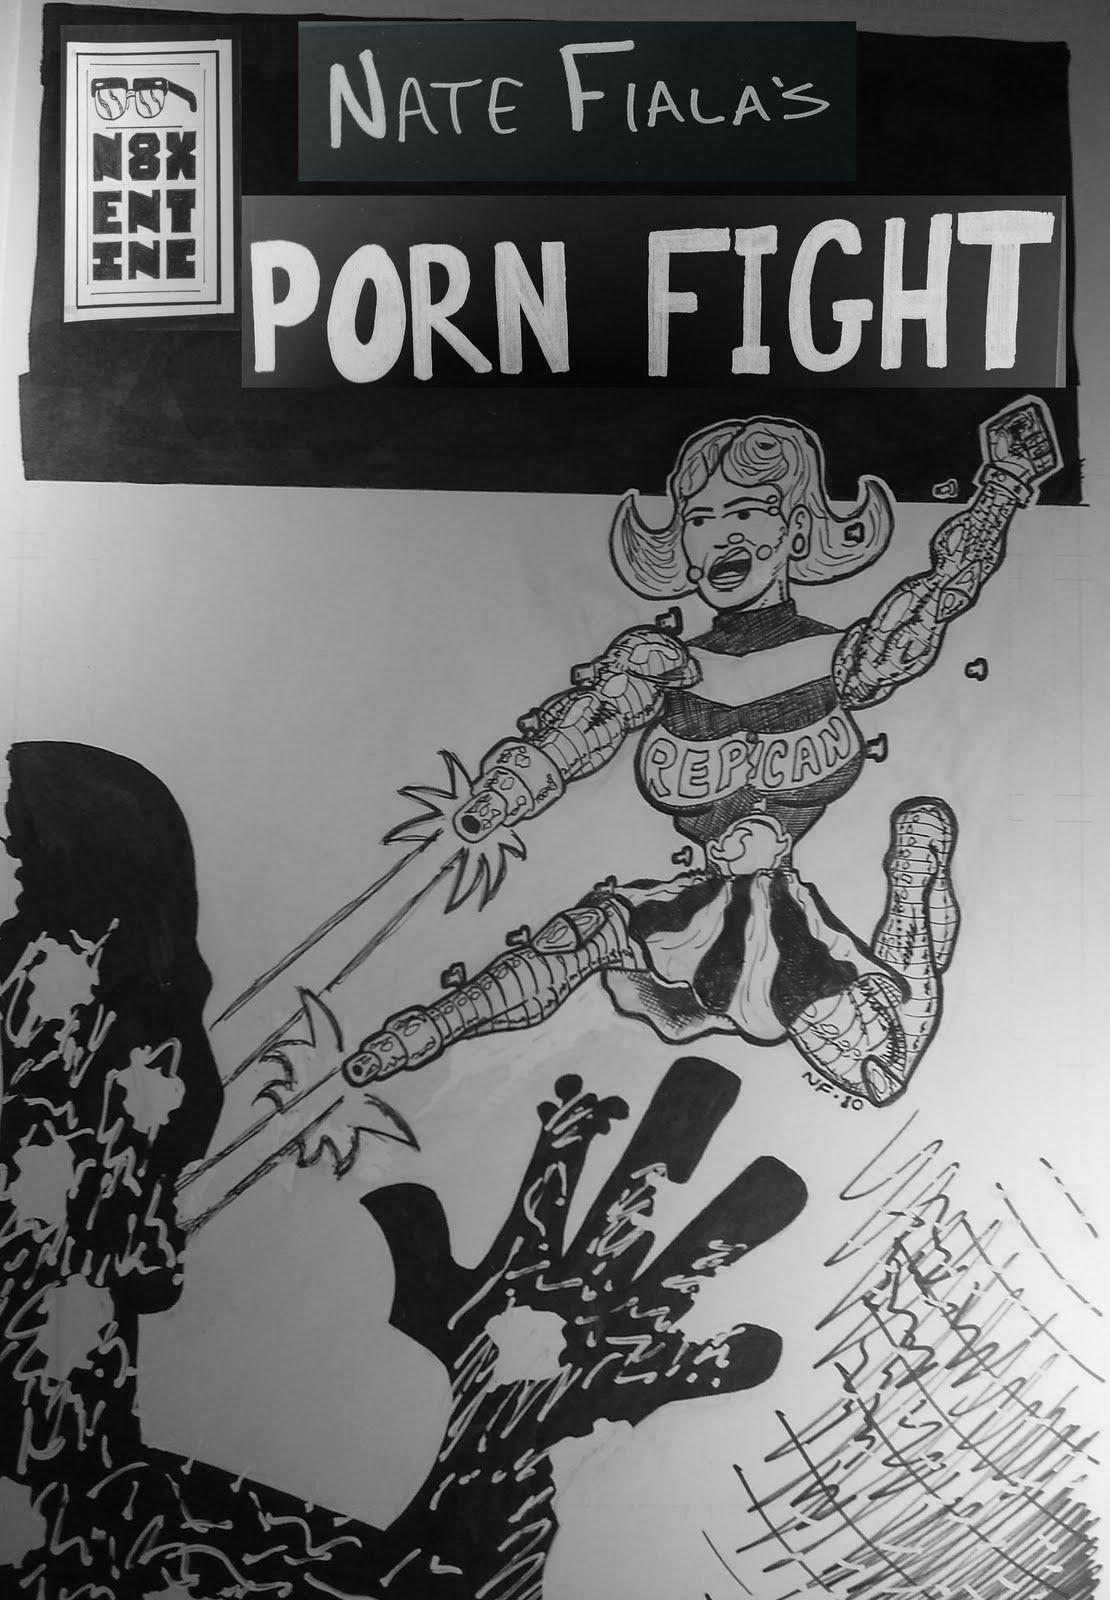 PORN FIGHT!